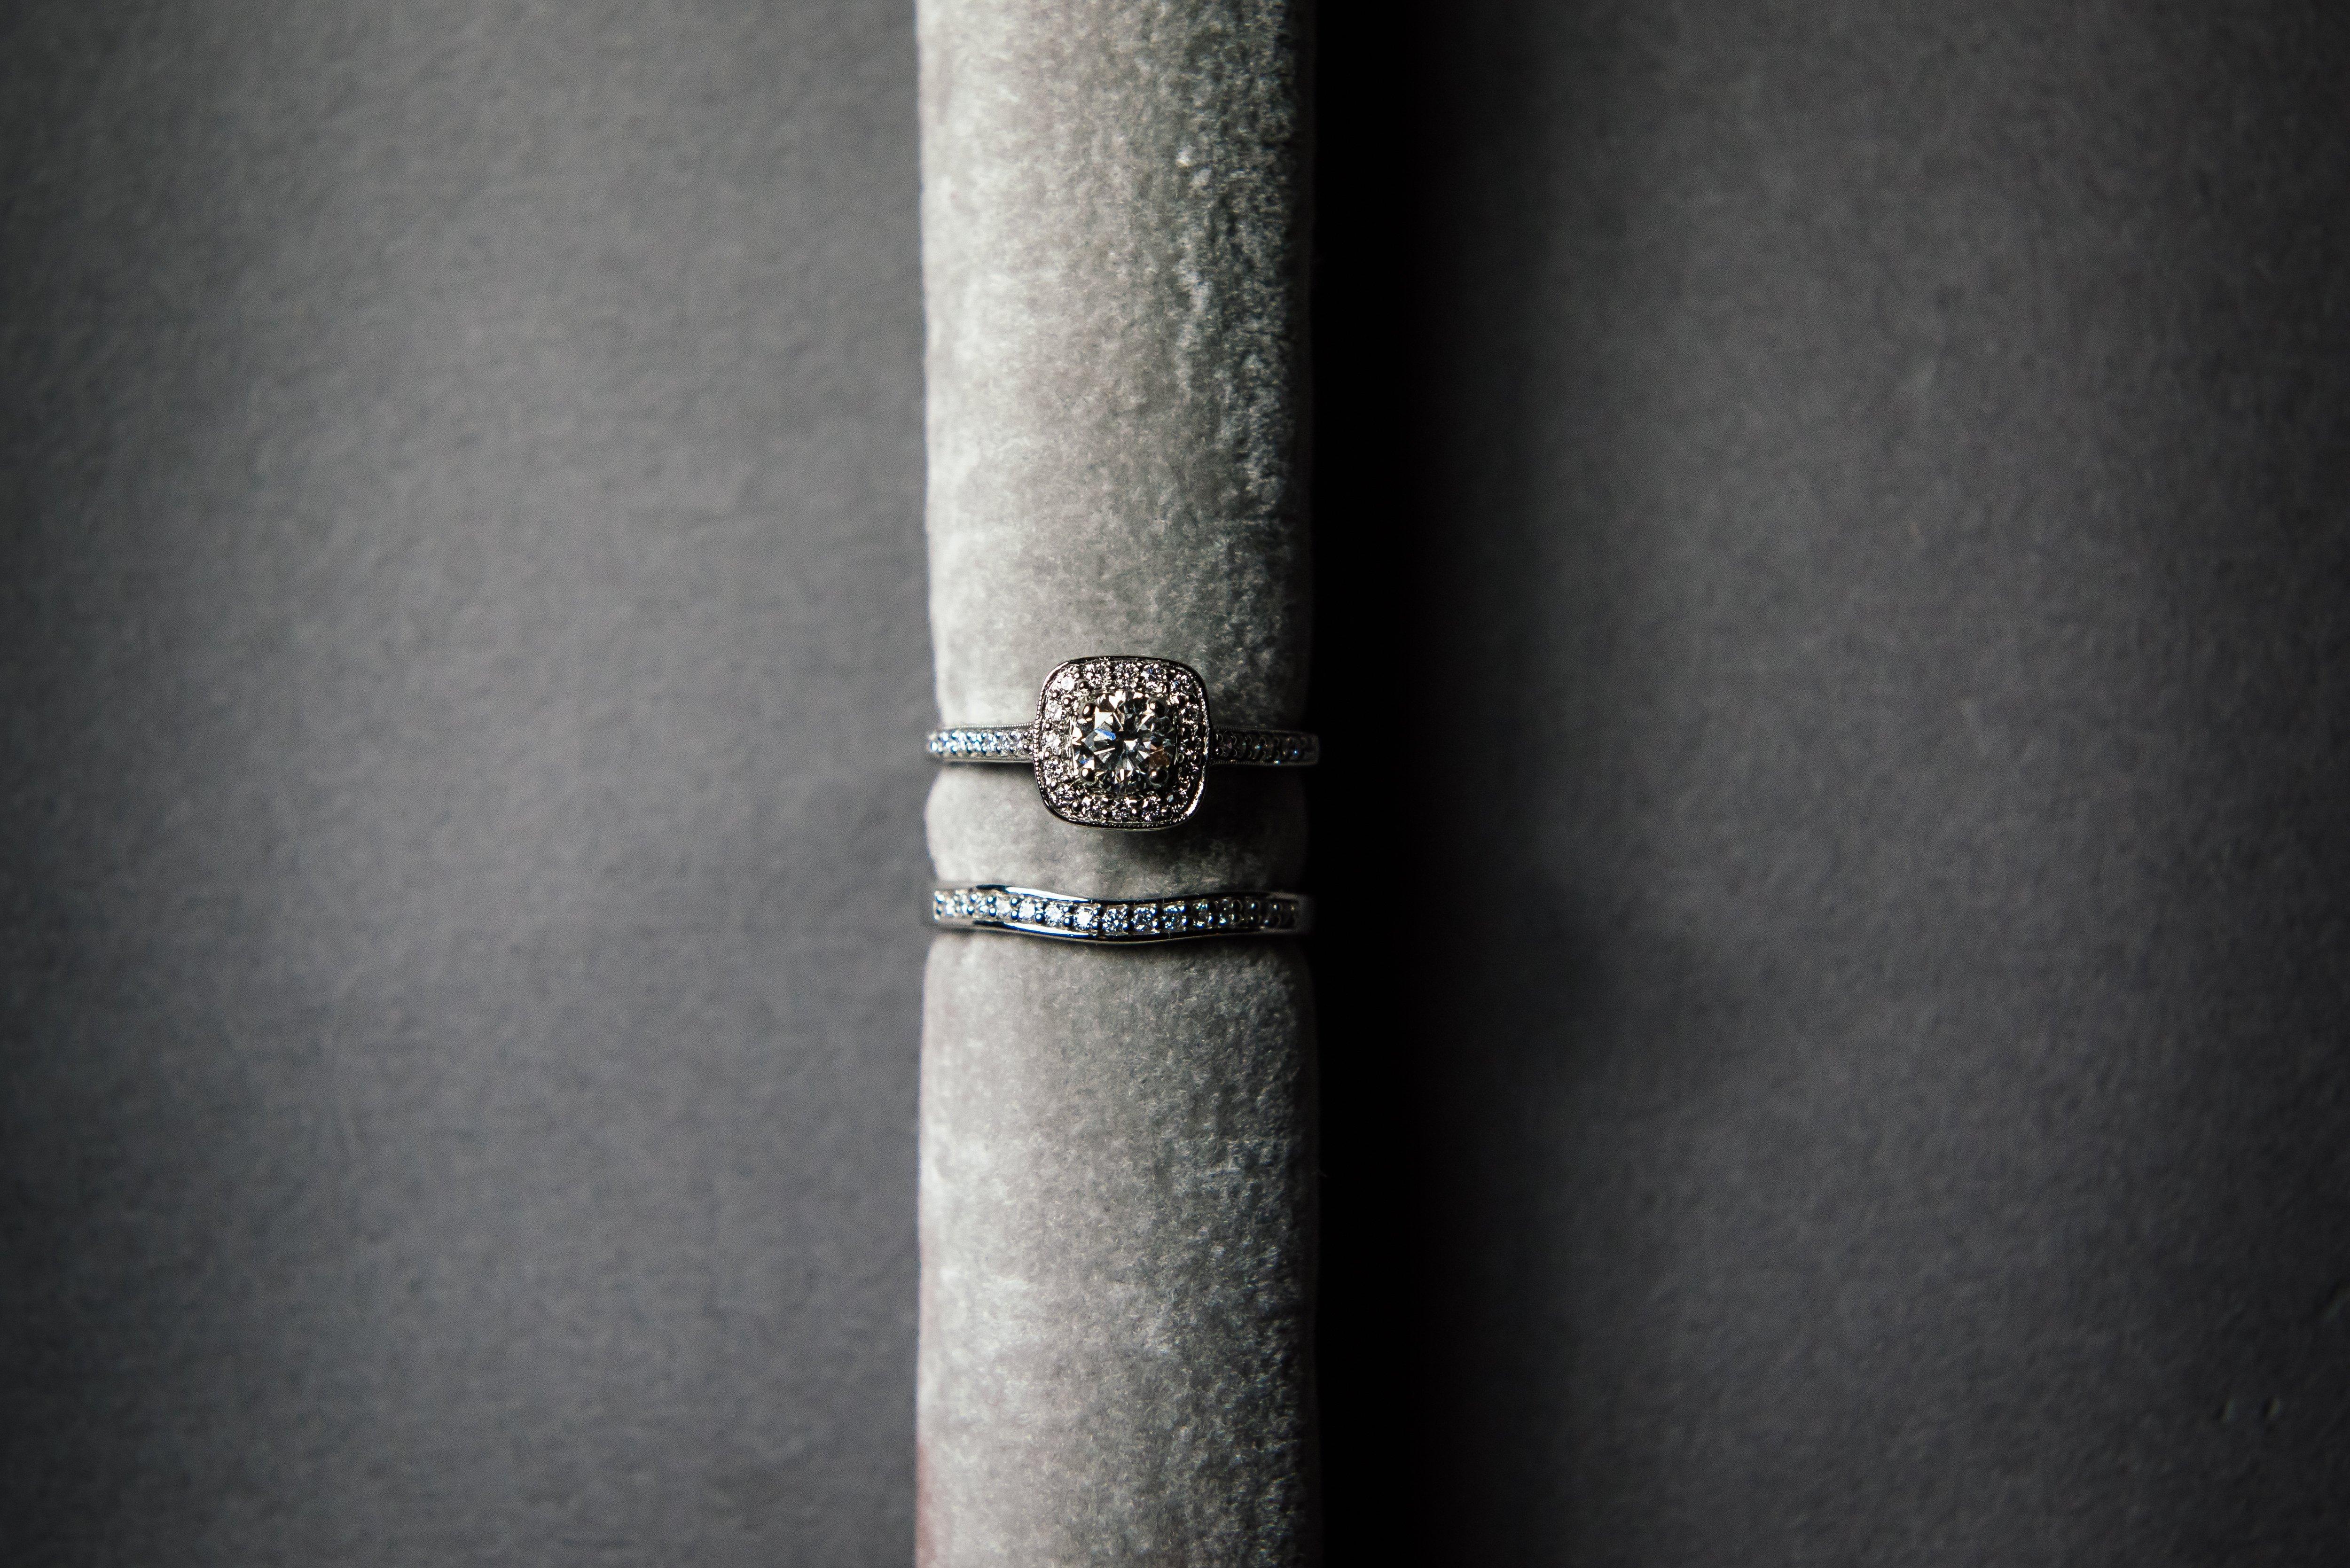 A single wedding ring